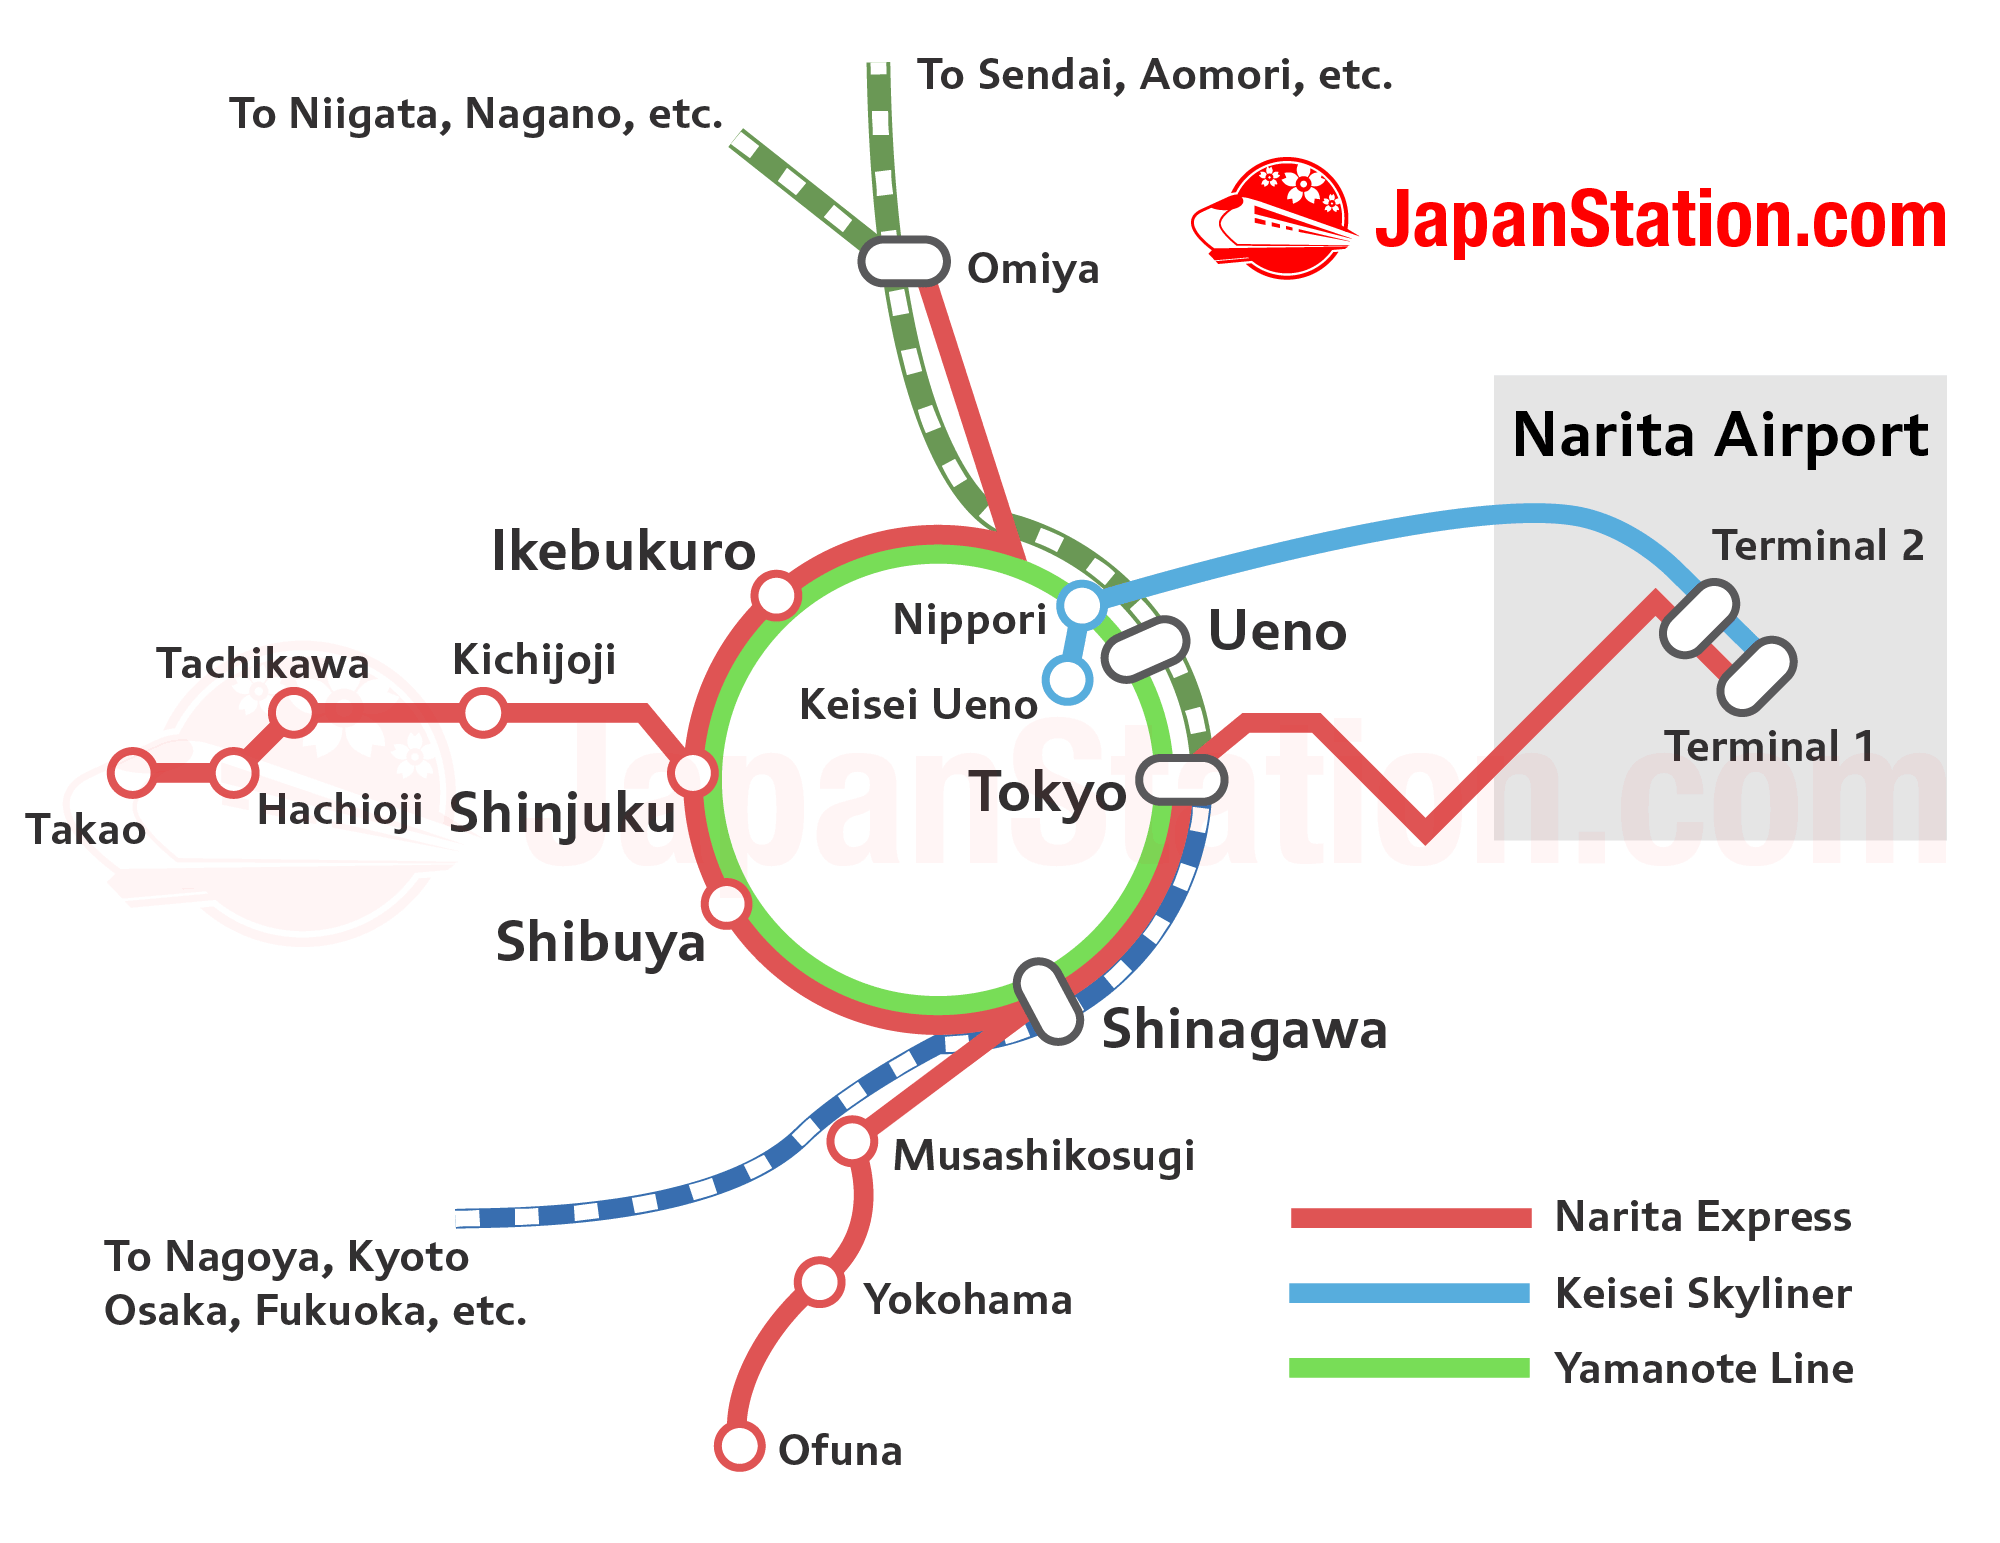 Narita Express Route Map Japan Station Pinterest Airport - Japan map airports